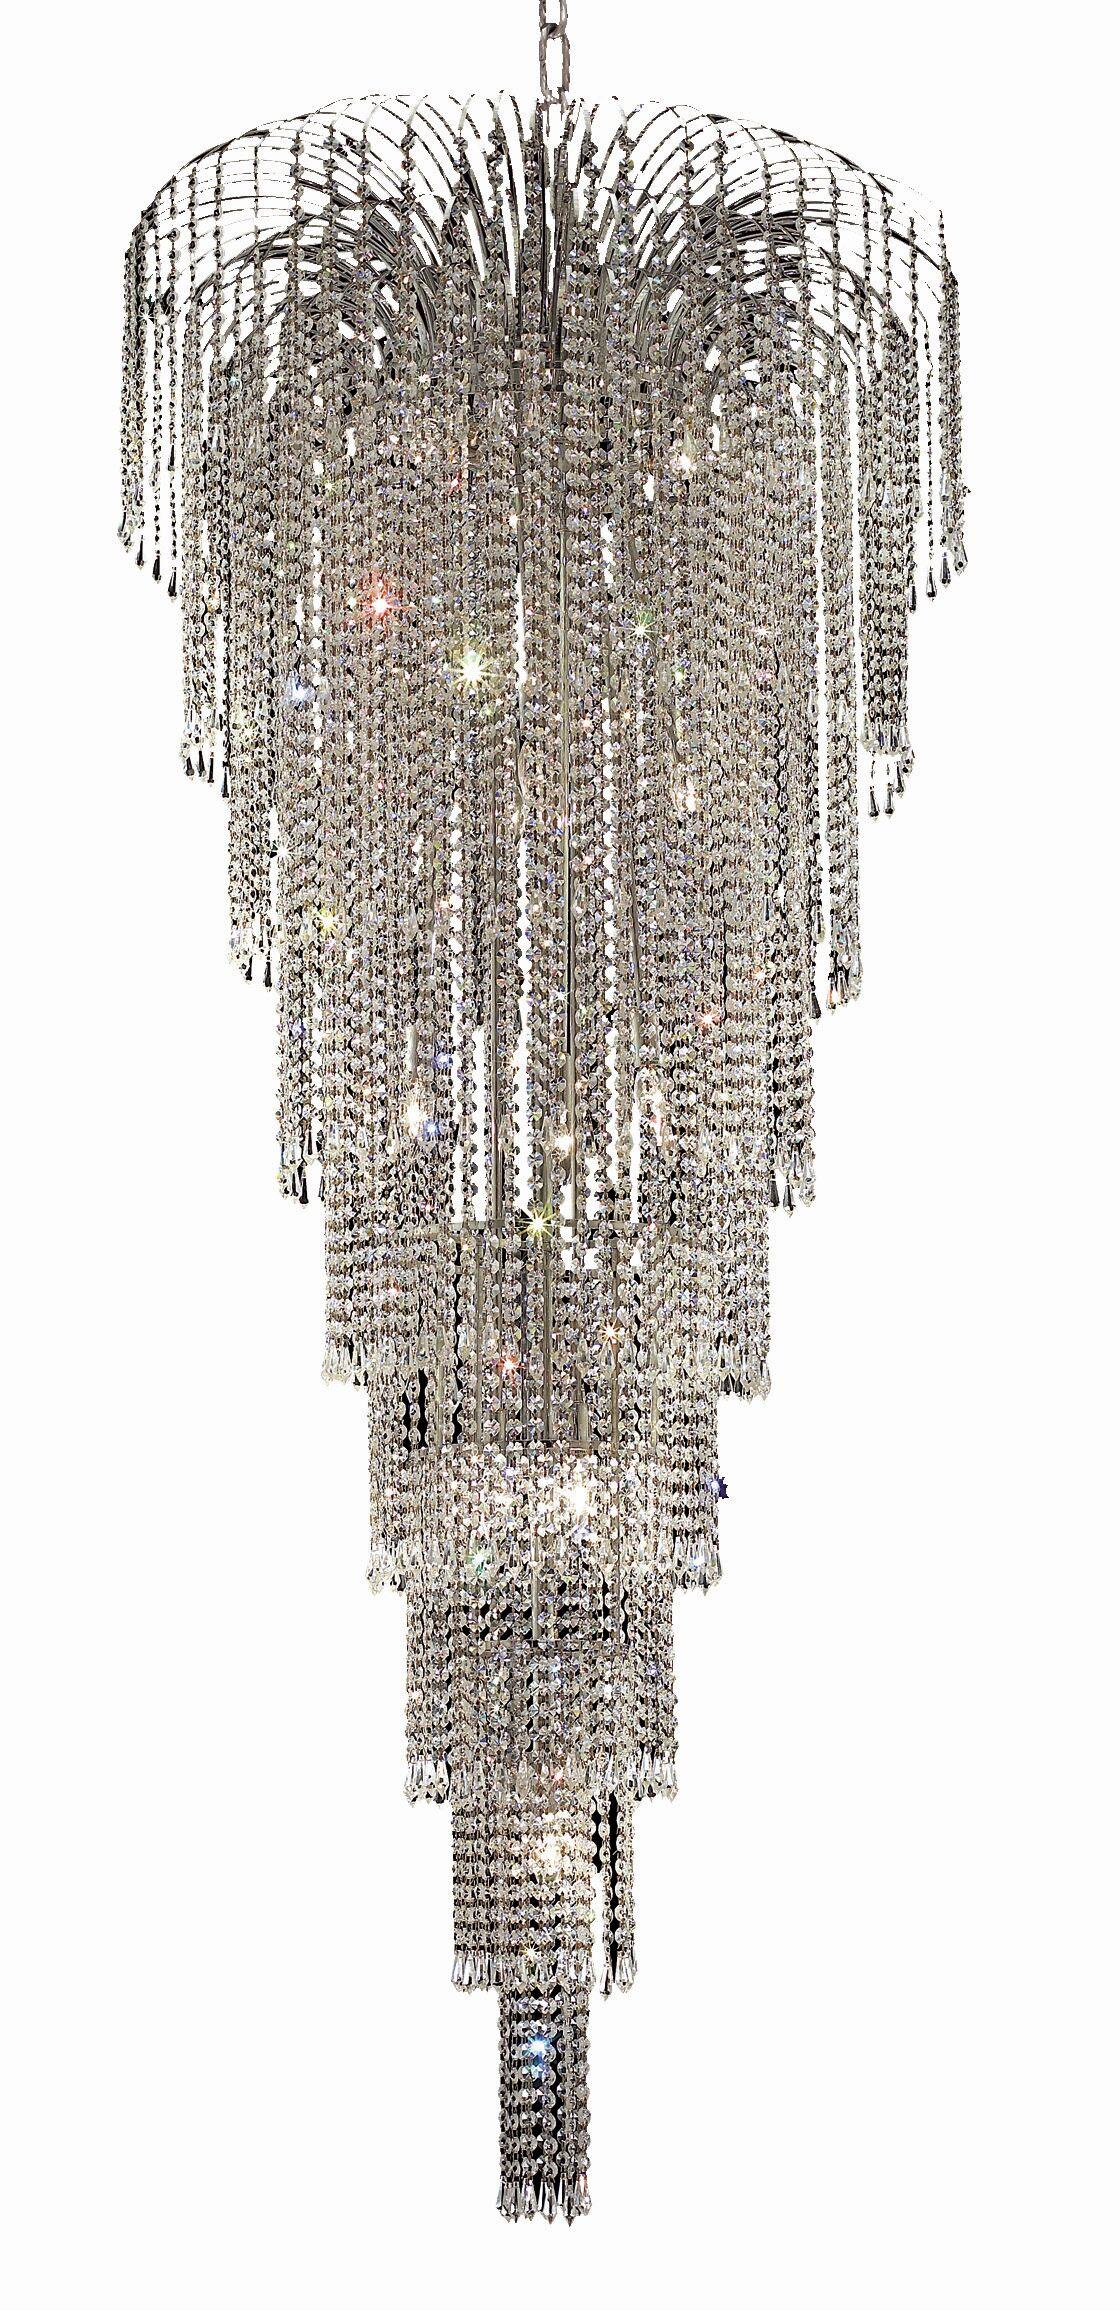 Westrem 15-Light Crystal Chandelier Finish: Chrome, Crystal Grade: Swarovski Spectra